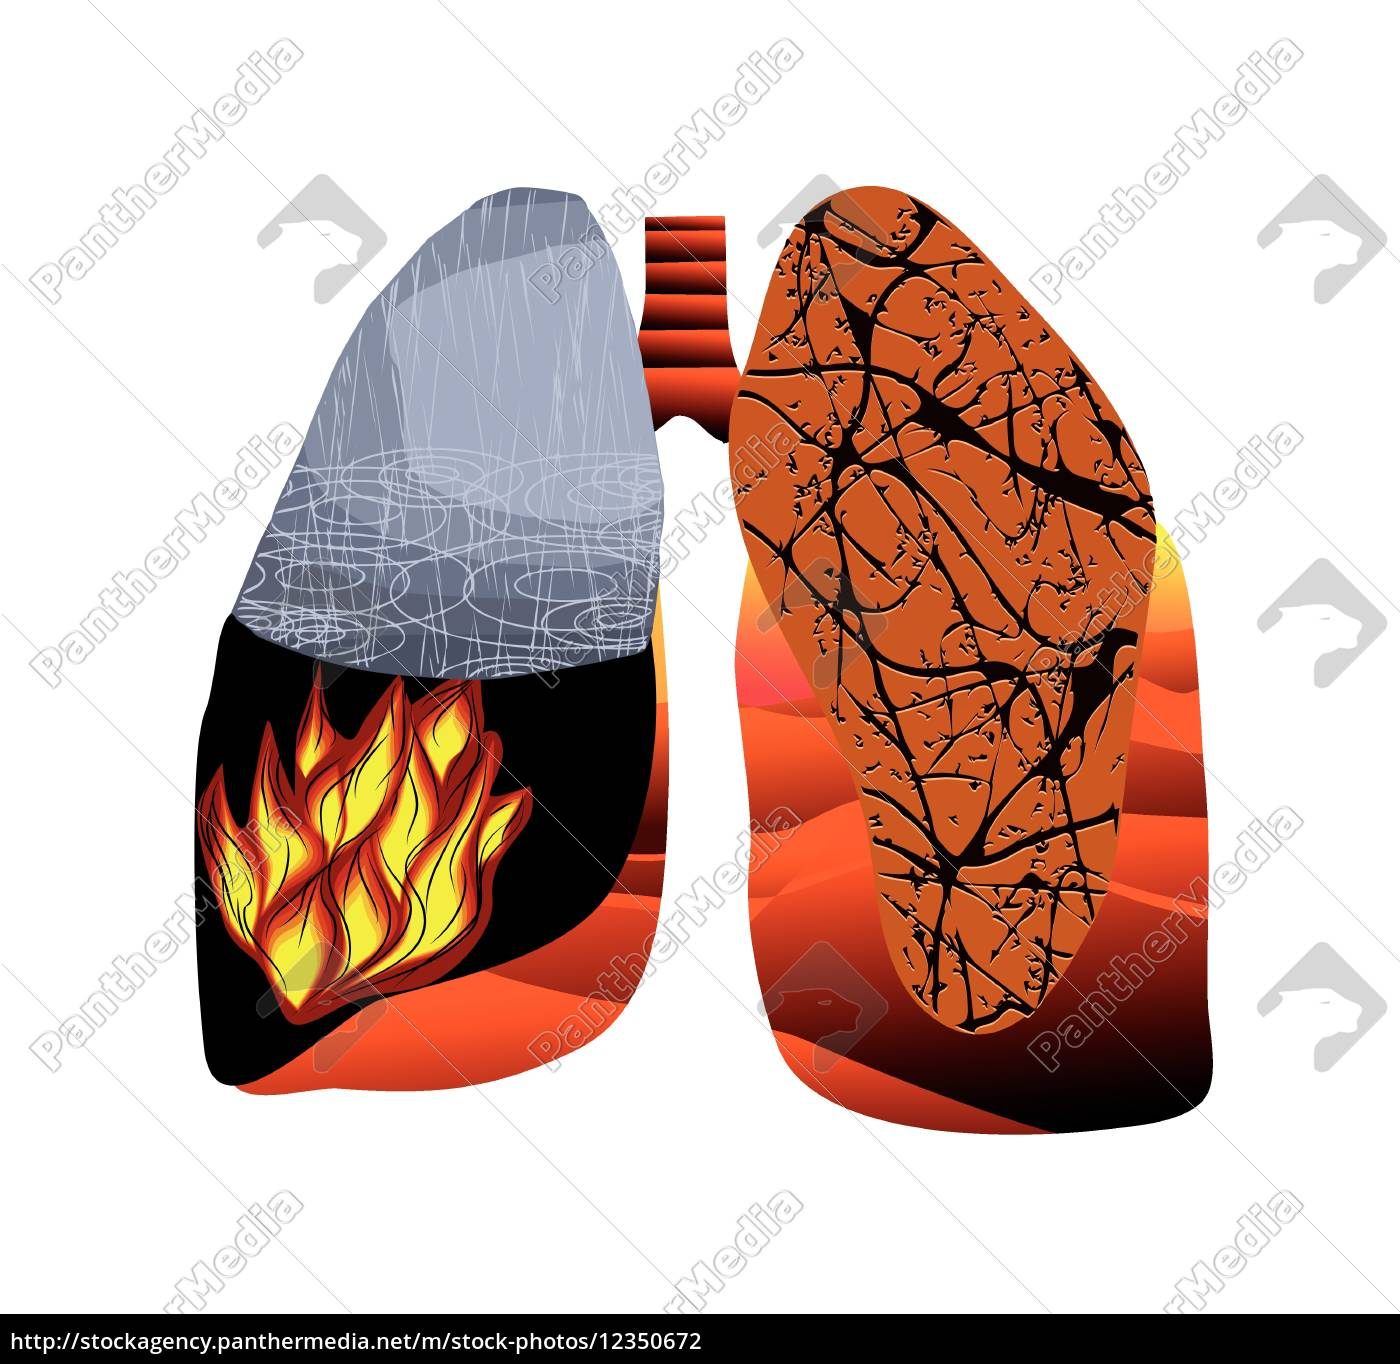 tuberkulose - 12350672